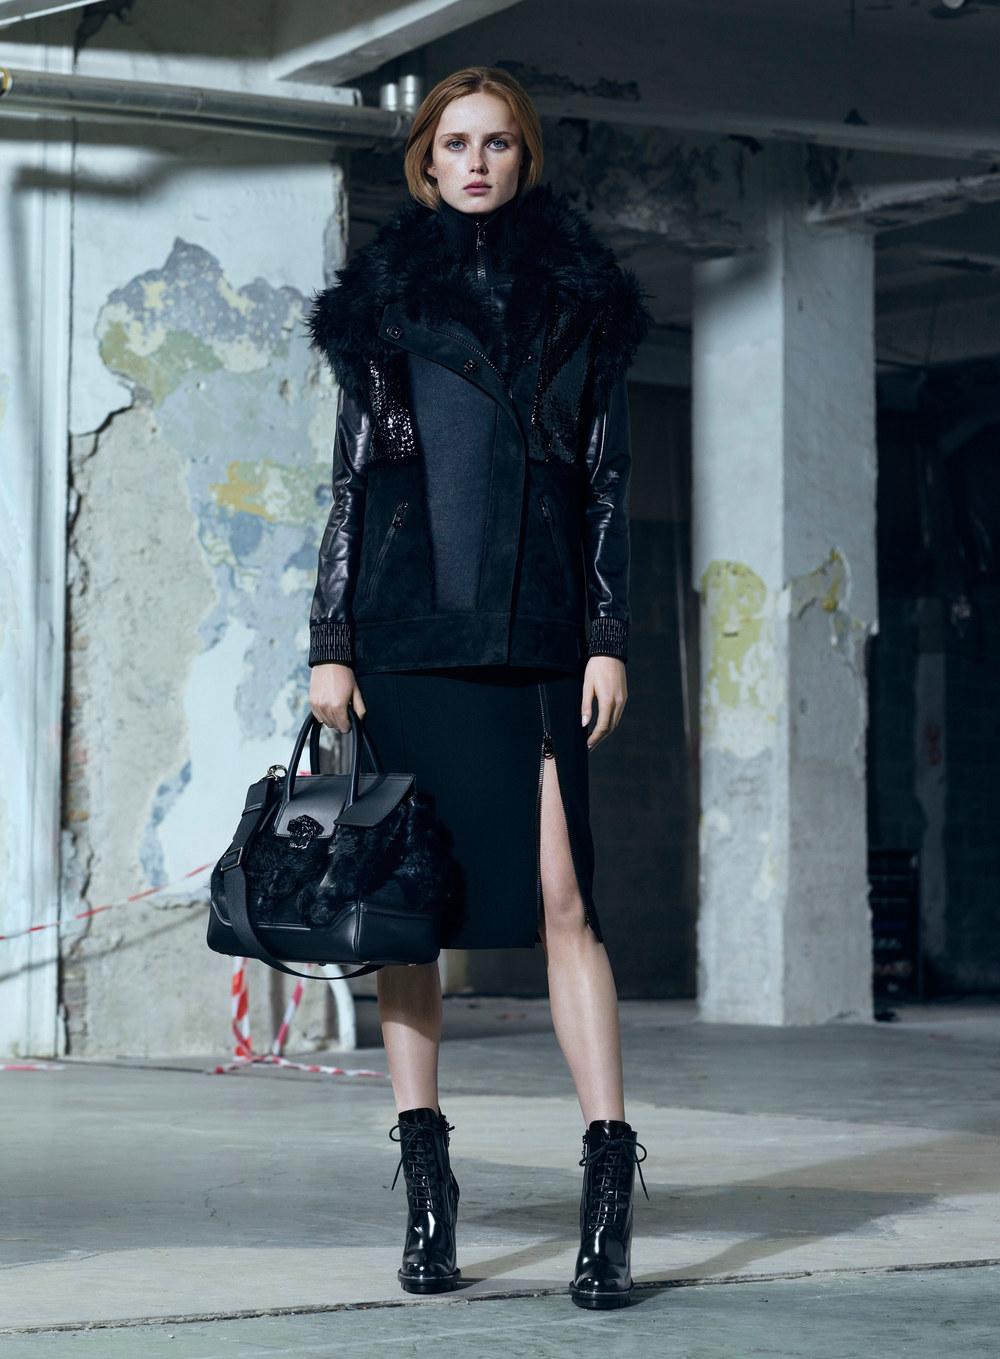 versace-pre-fall-2016-lookbook-15.jpg